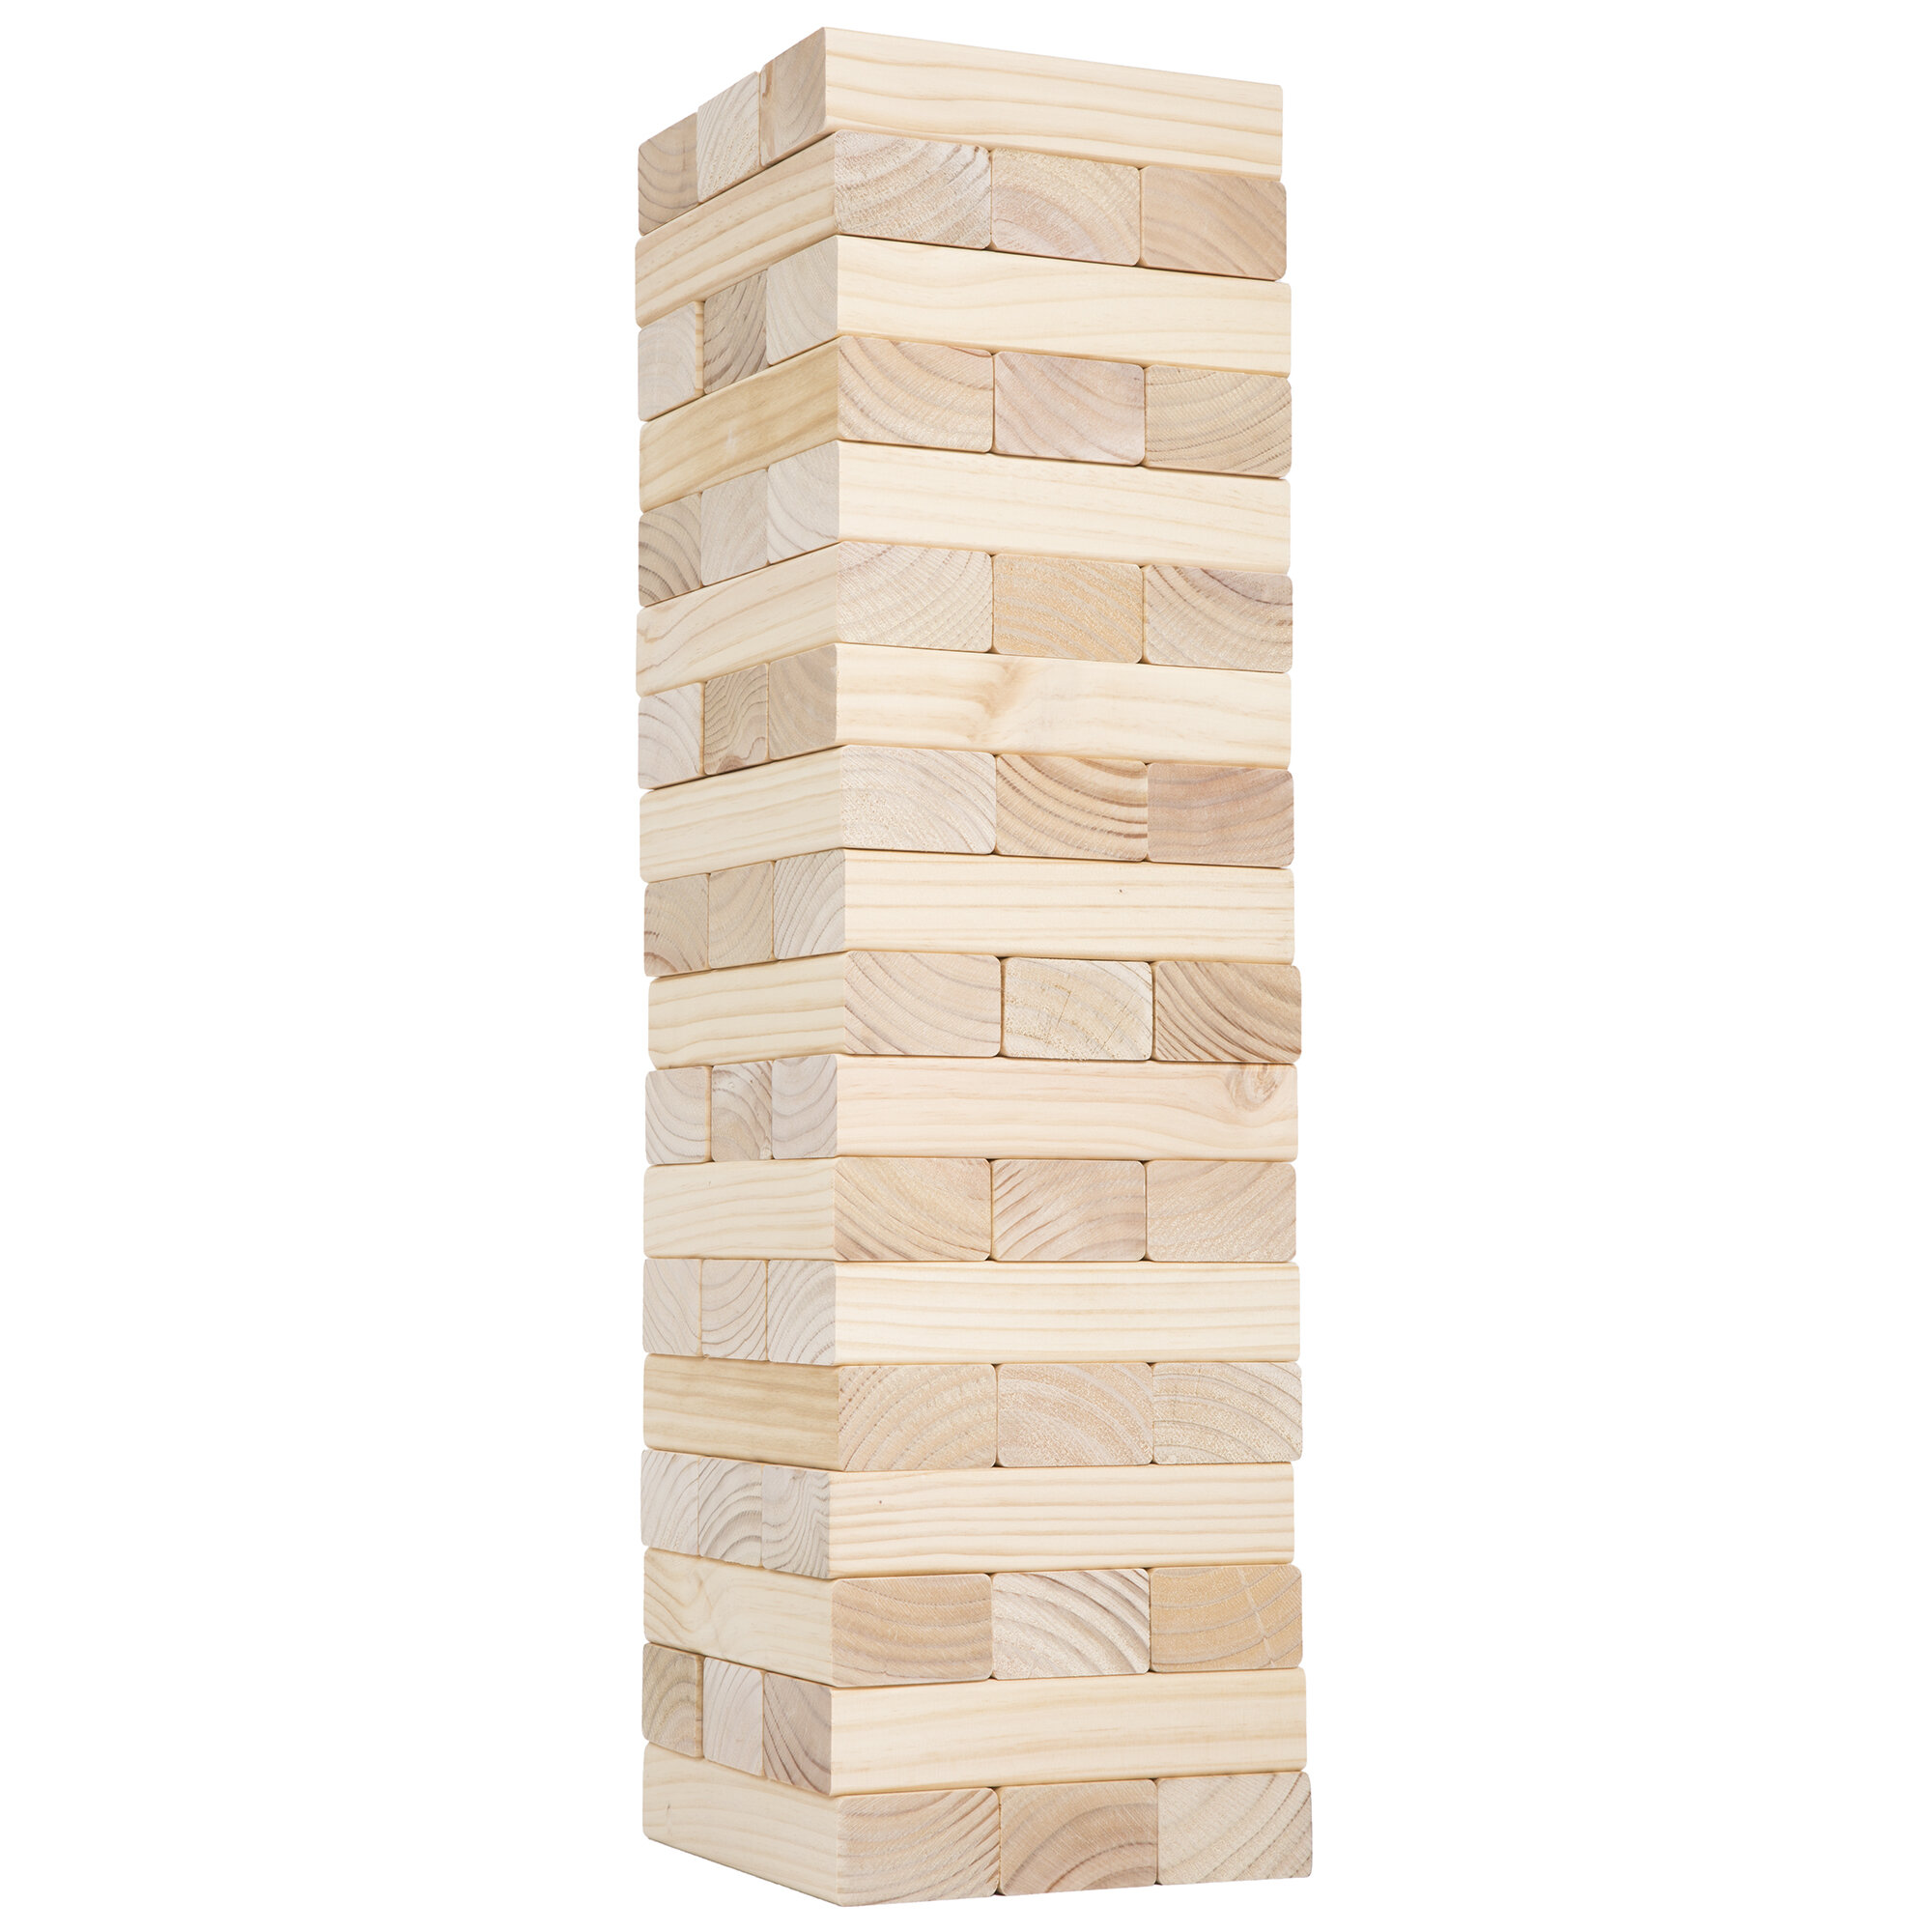 Clic Giant Wooden Blocks Tower Stacking Reviews Wayfair